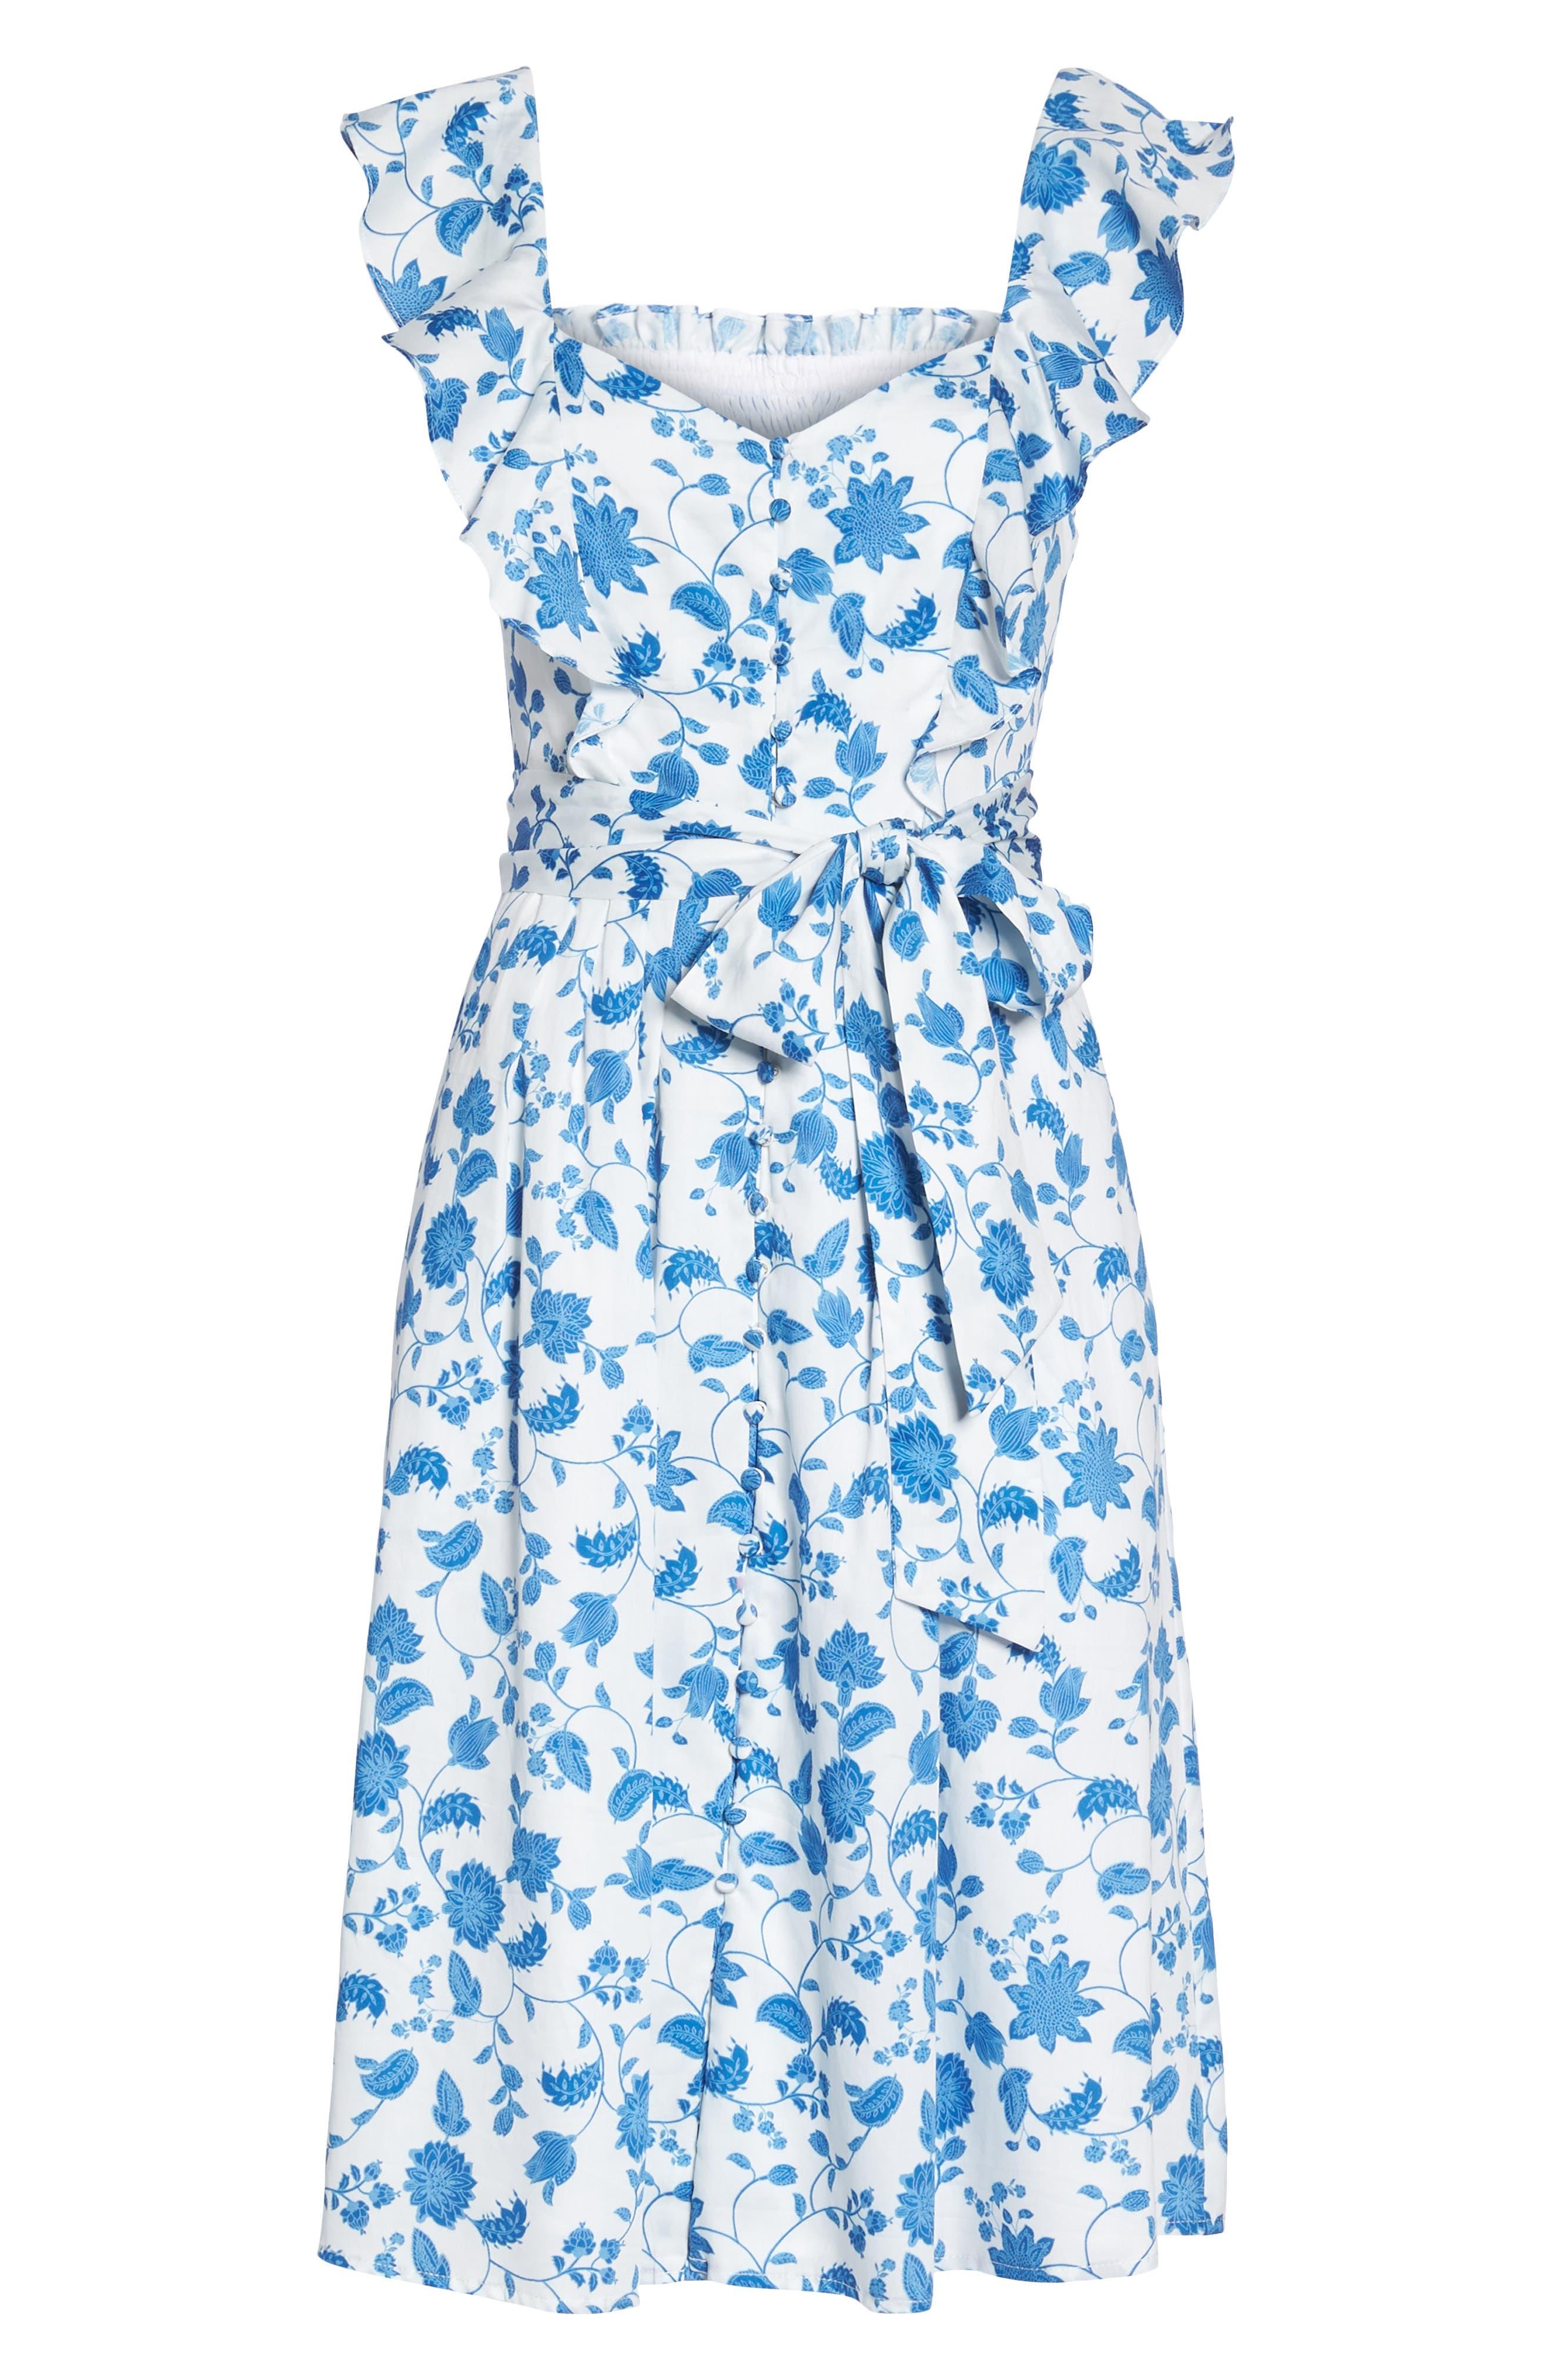 Olivia Floral Wallpaper Print Fit & Flare Dress,                             Alternate thumbnail 8, color,                             Cloud/ Blue